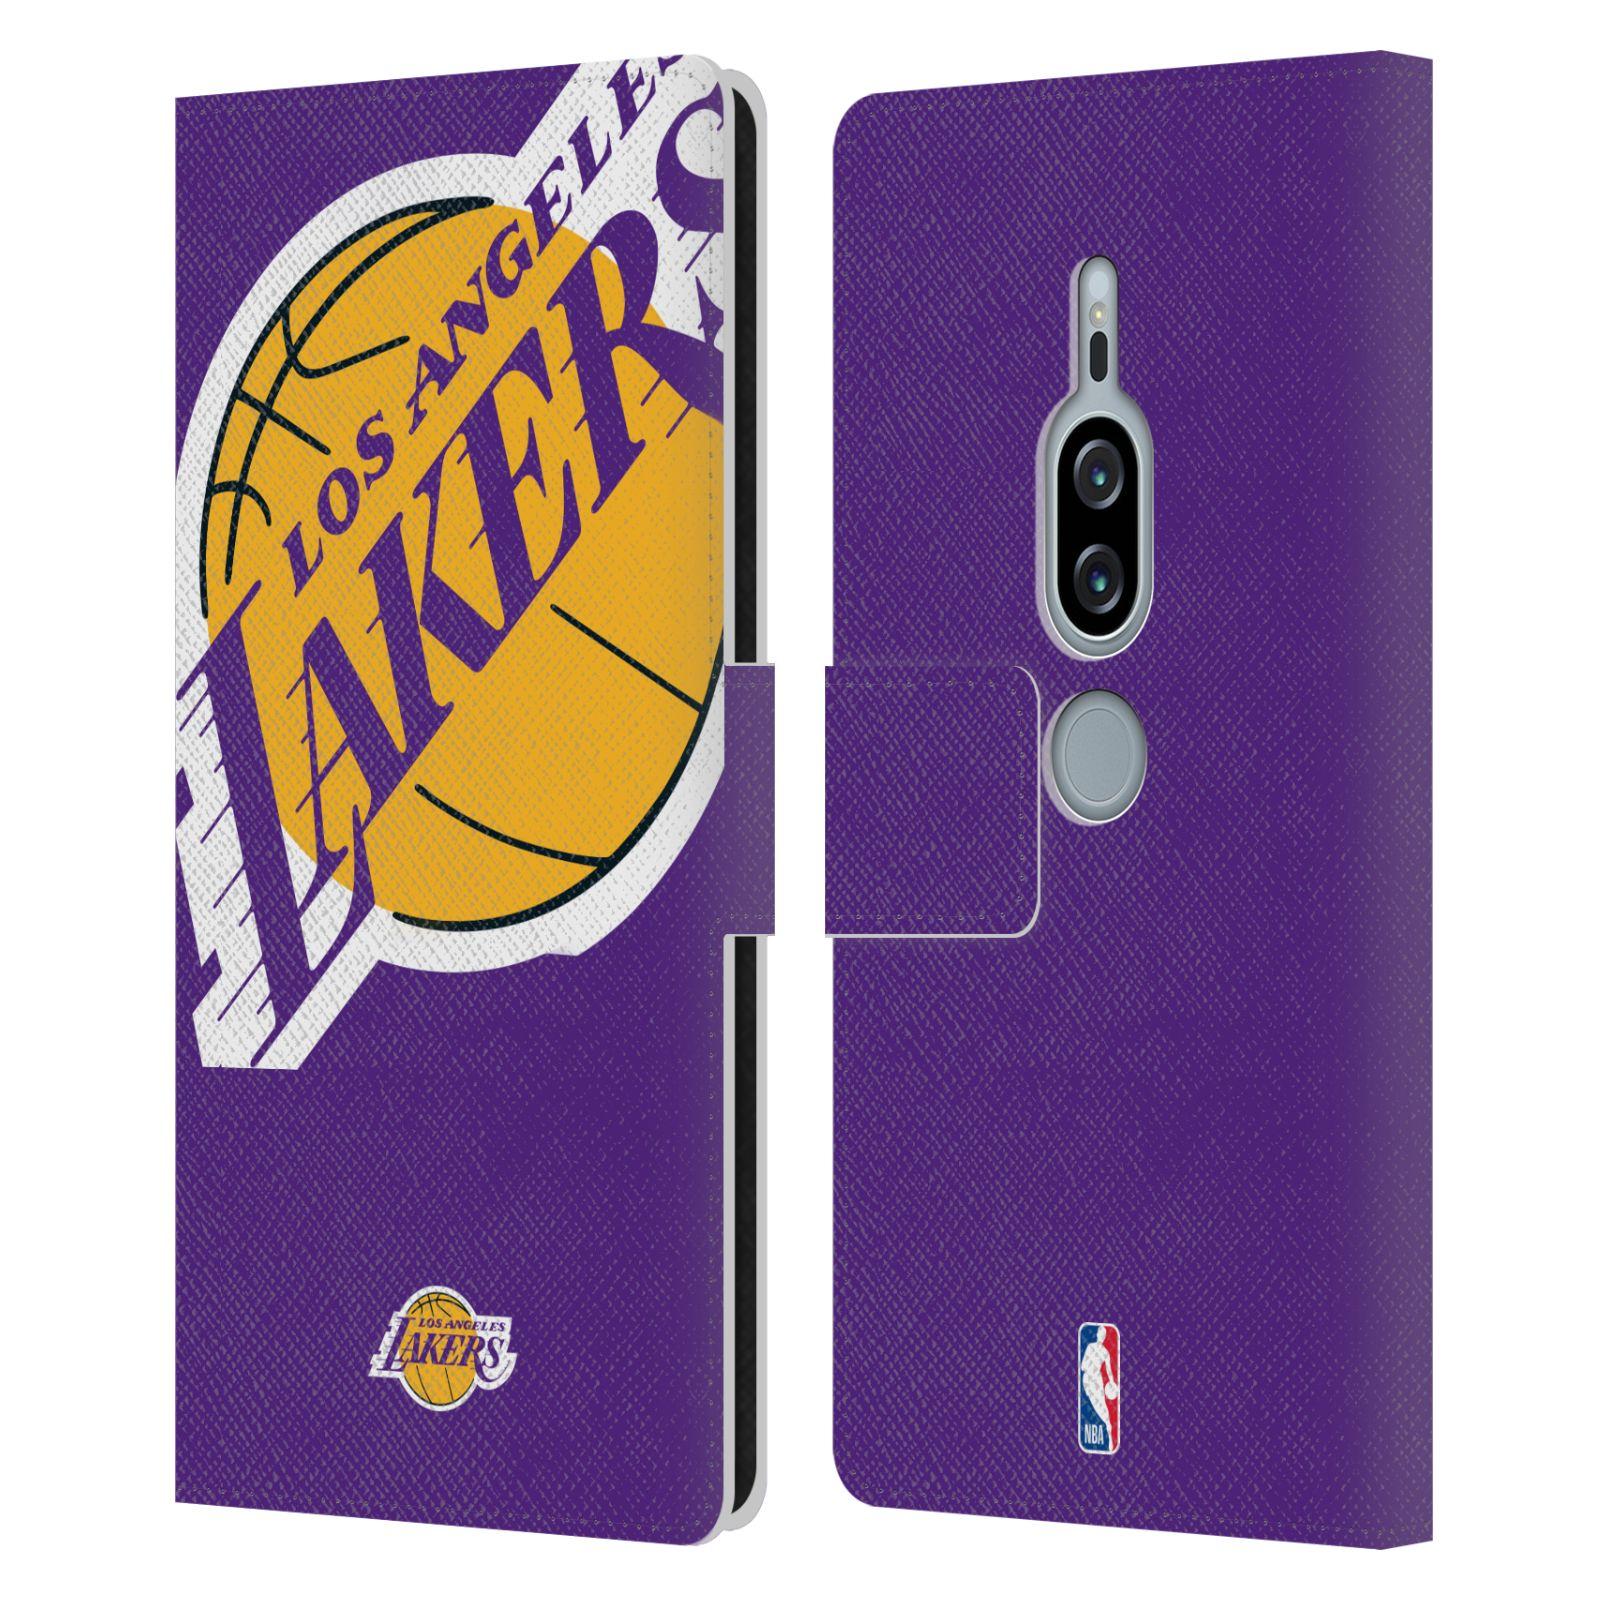 Pouzdro na mobil Sony Xperia XZ2 Premium - Head Case - NBA - Los Angeles Lakers velký znak